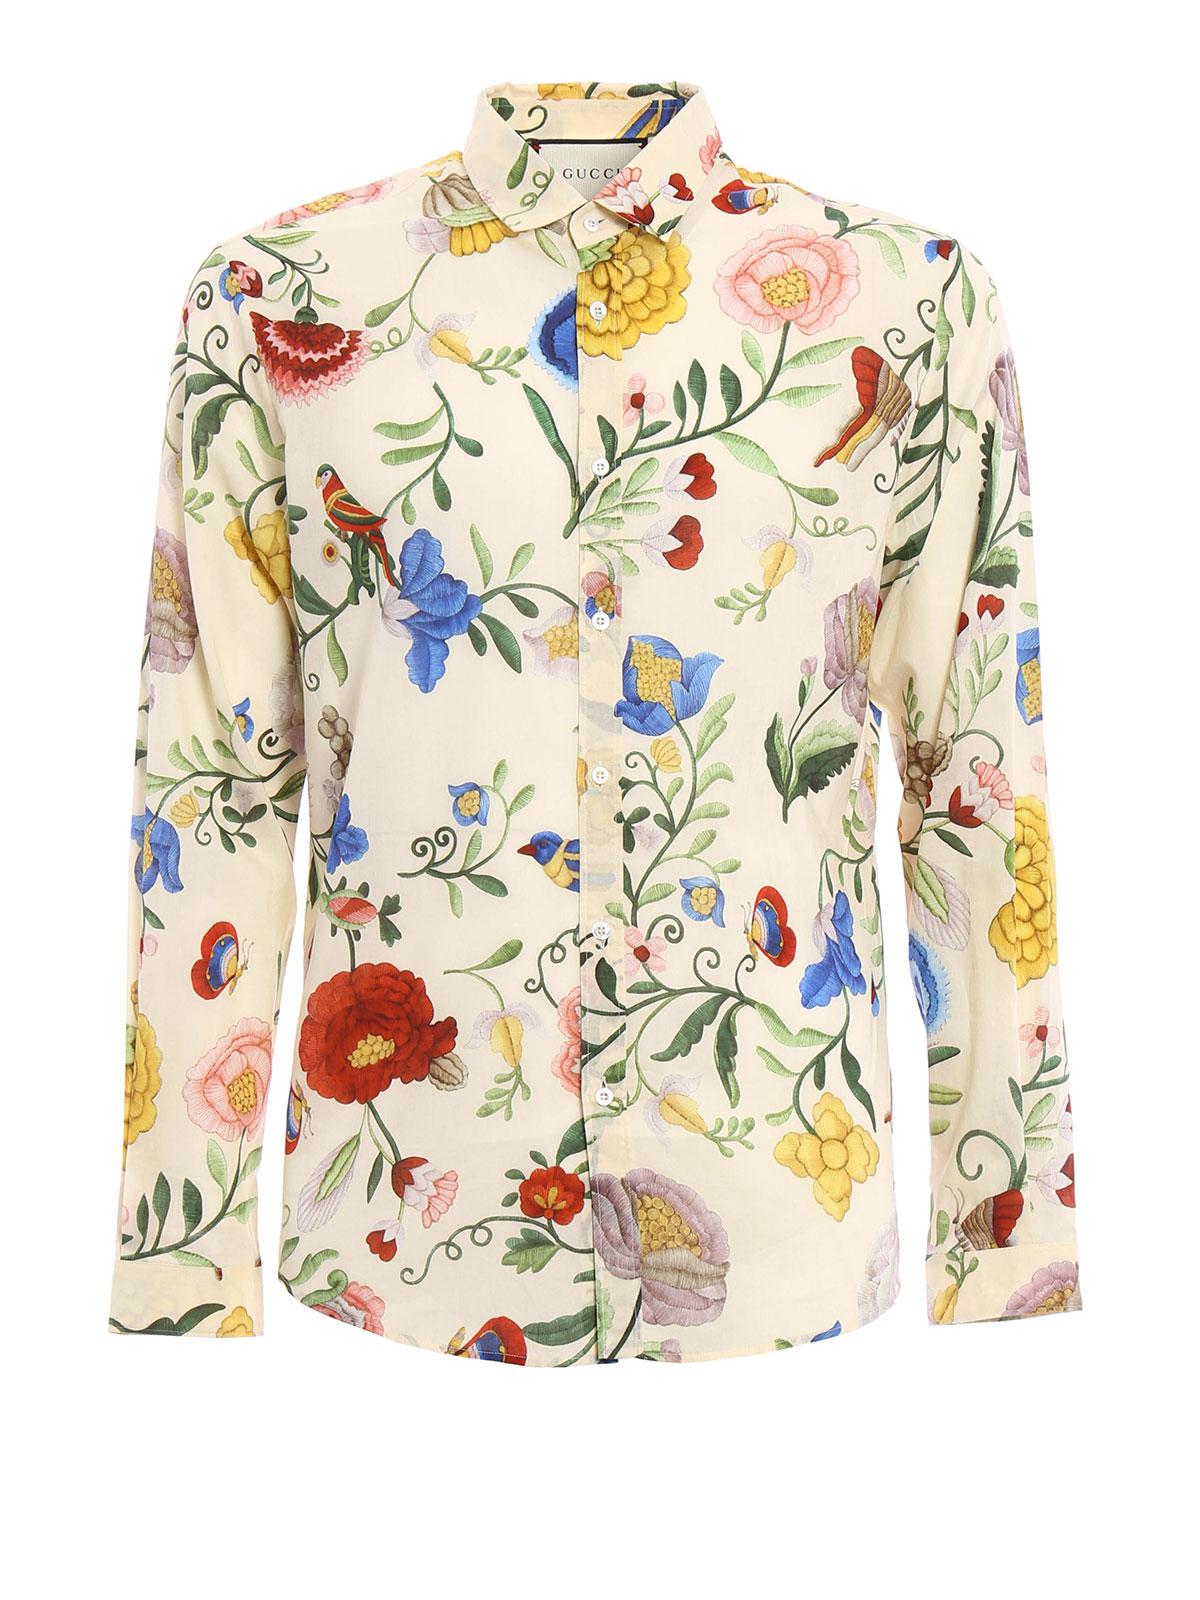 ae2727c5292b3 Gucci - Duke floral pattern shirt - shirts - MJ9 408602 Z326A 9275